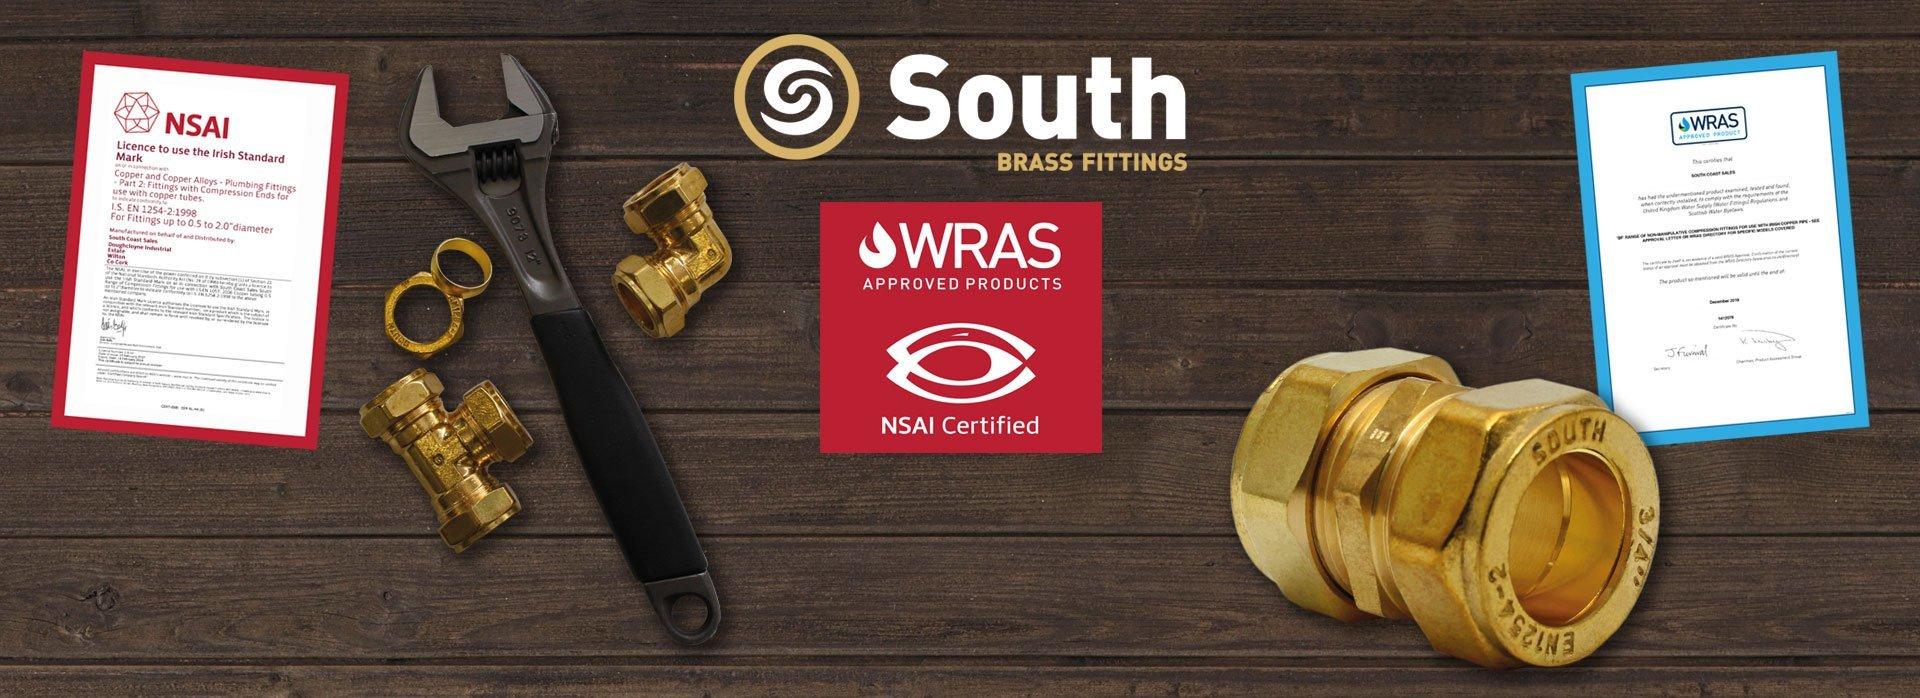 South Brass Fittings slide